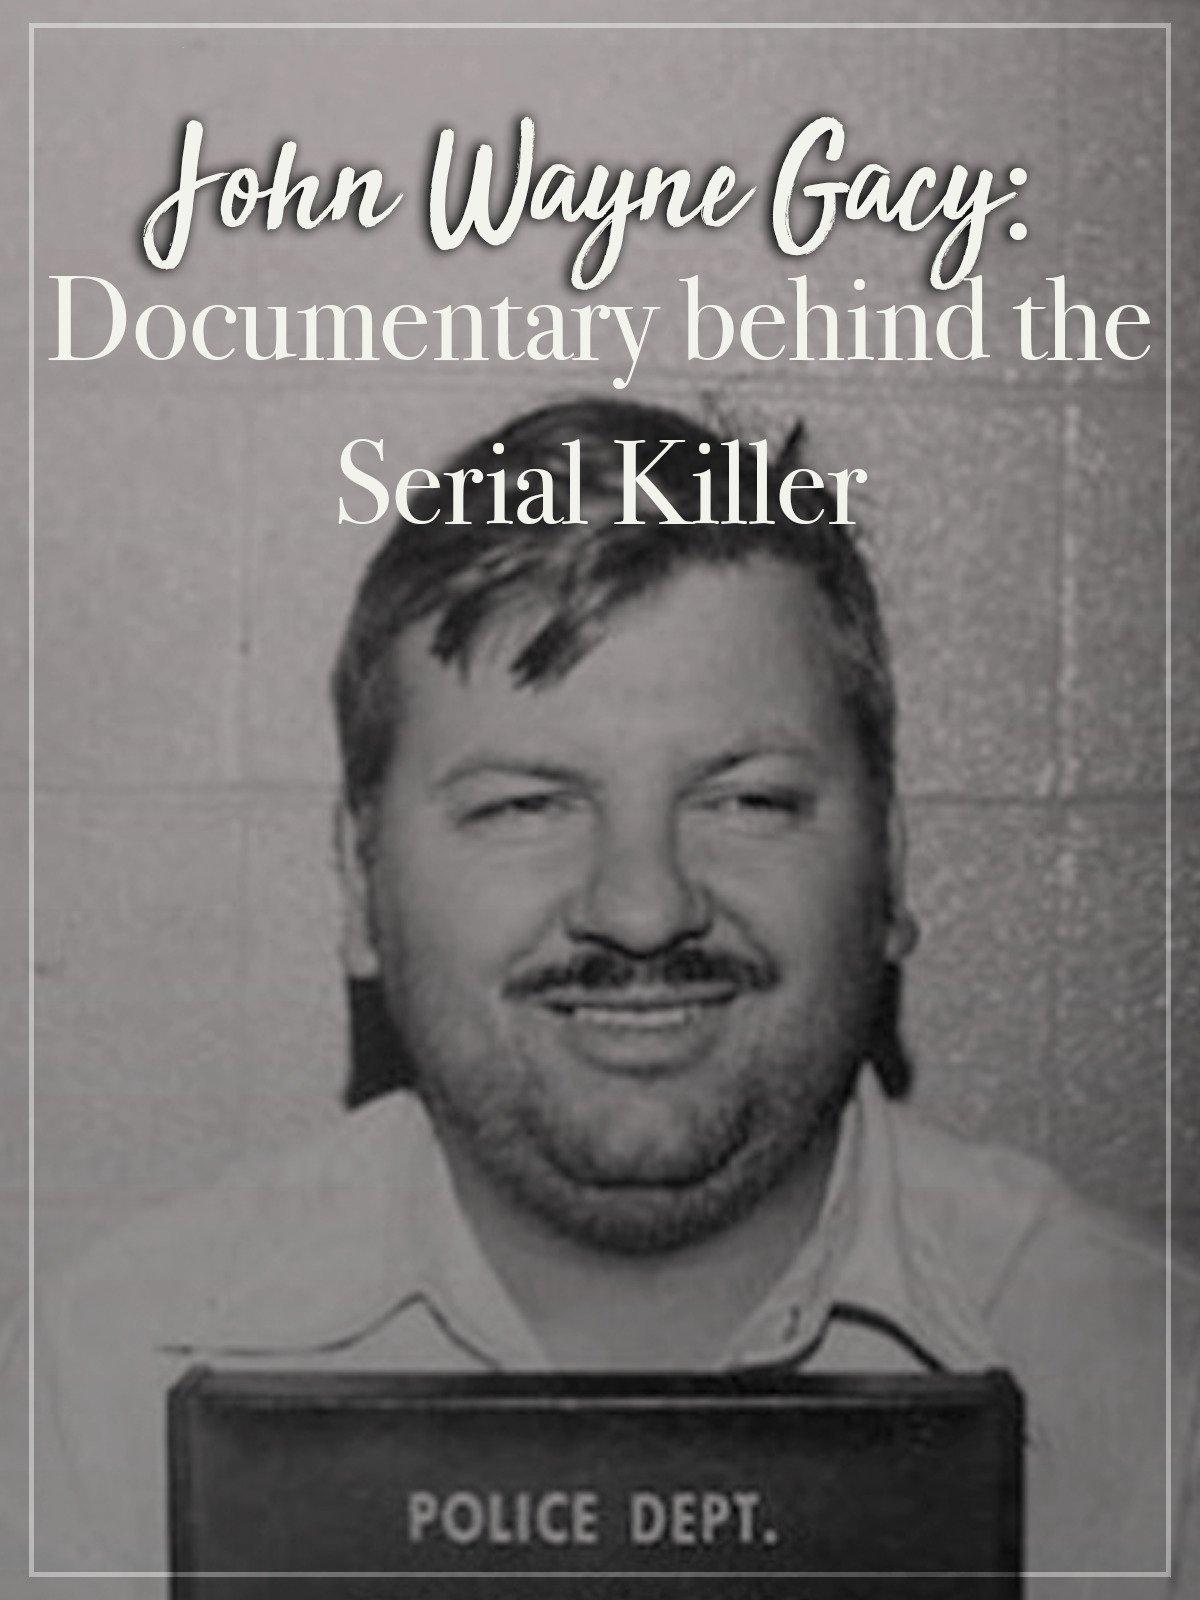 John Wayne Gacy: Documentary behind the Serial Killer